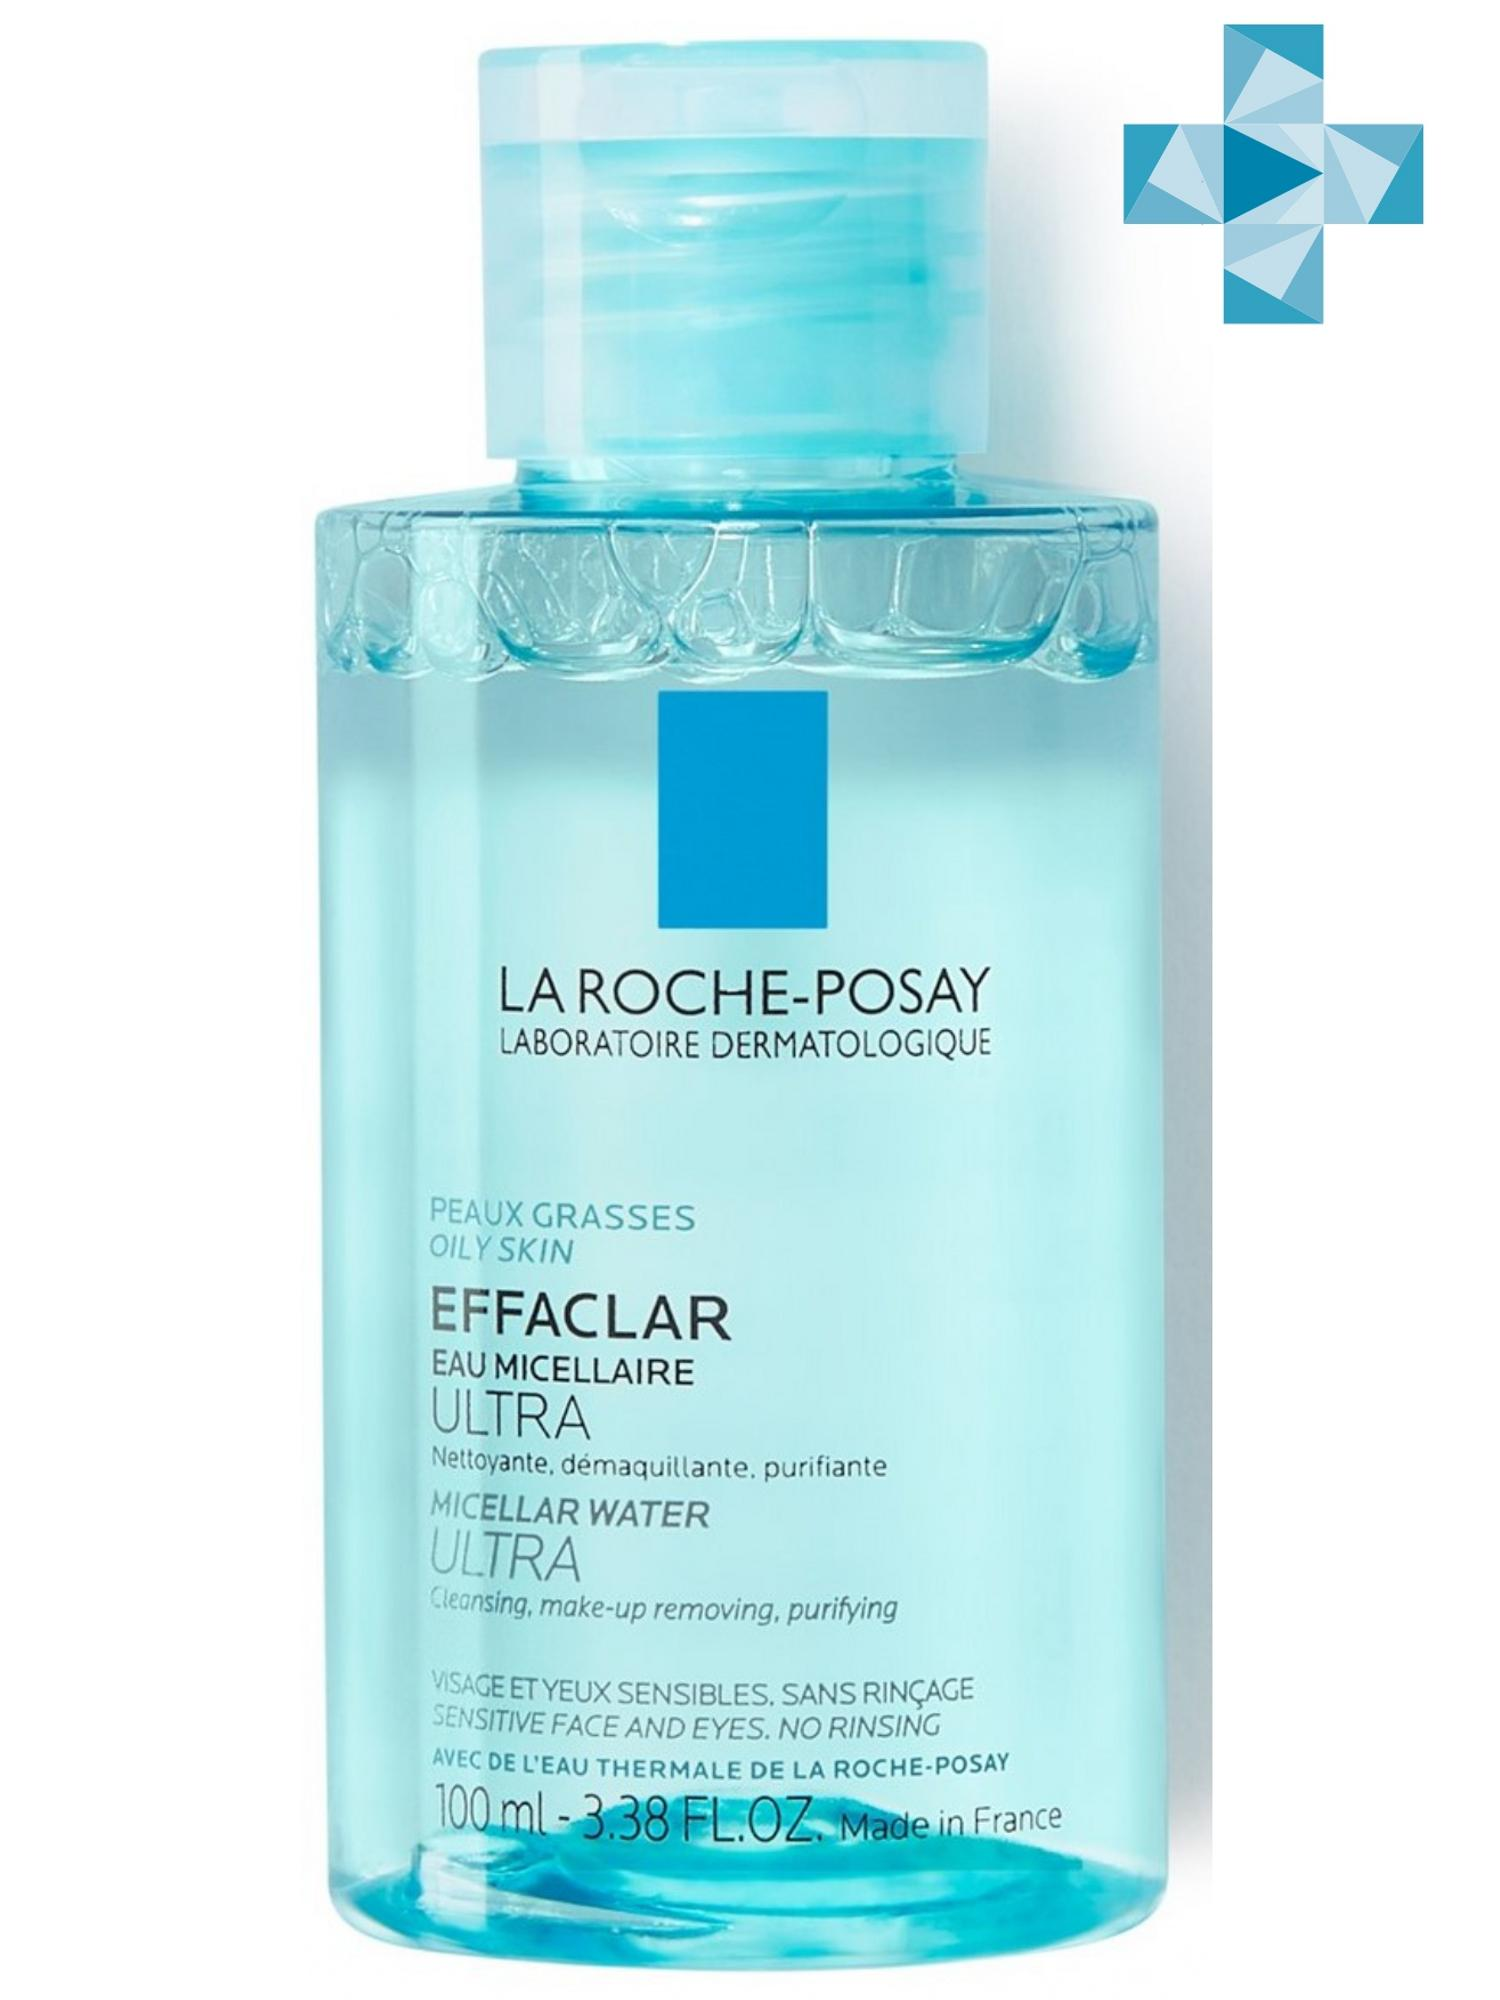 La Roche-Posay Мицеллярная вода Effaclar Ultra 100 мл (La Roche-Posay, Effaclar) la roche posay vitamin c10